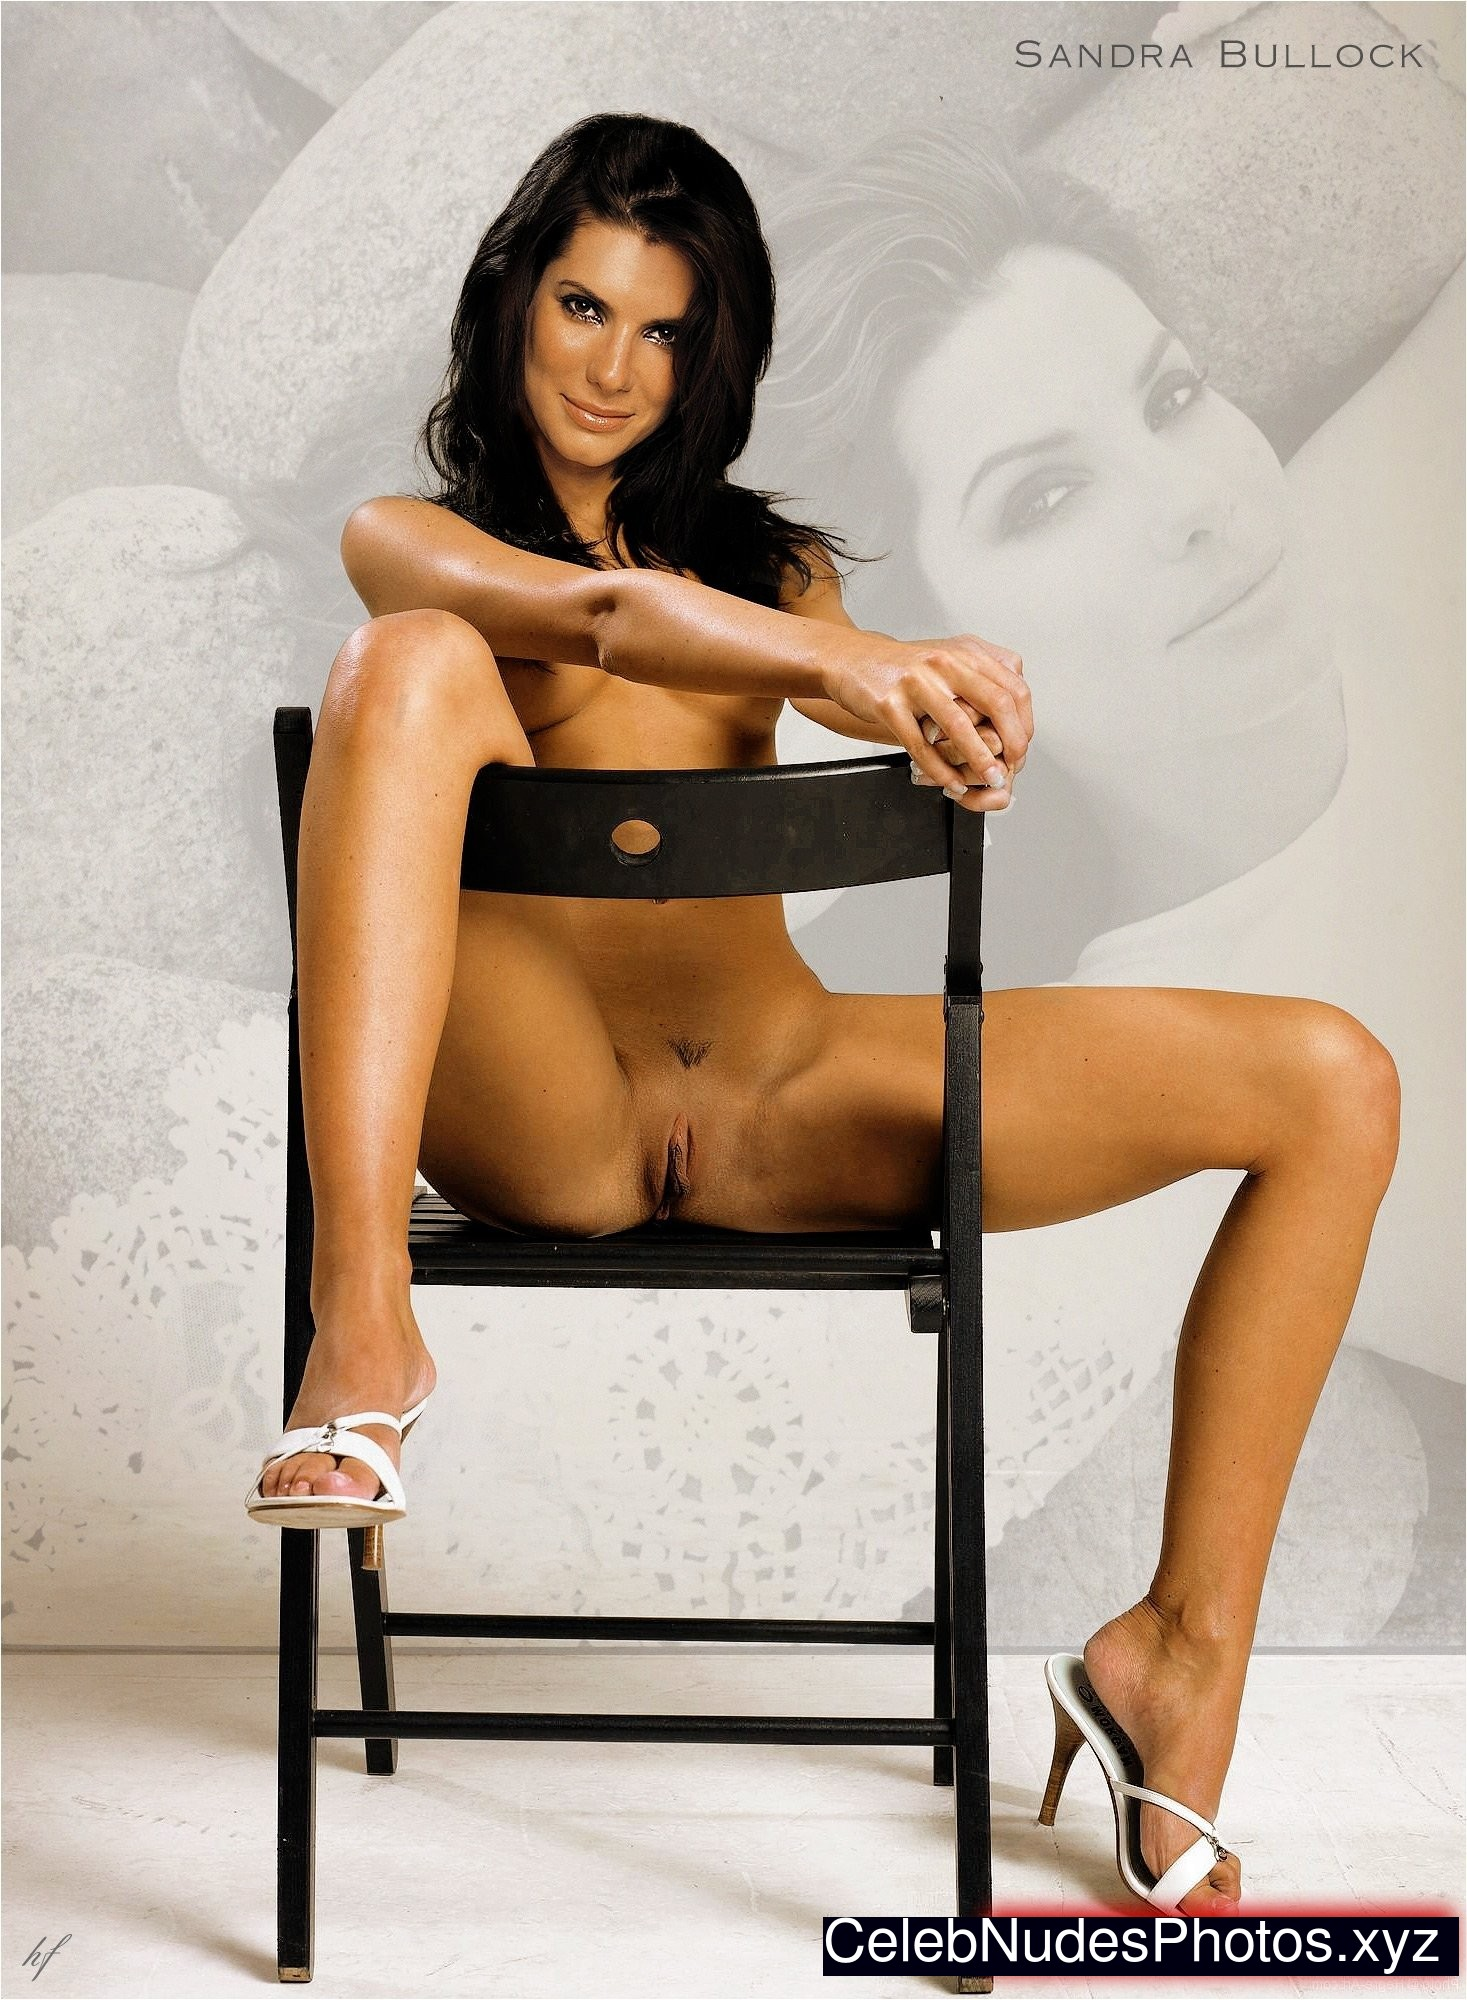 Sandra bullock porn gifs